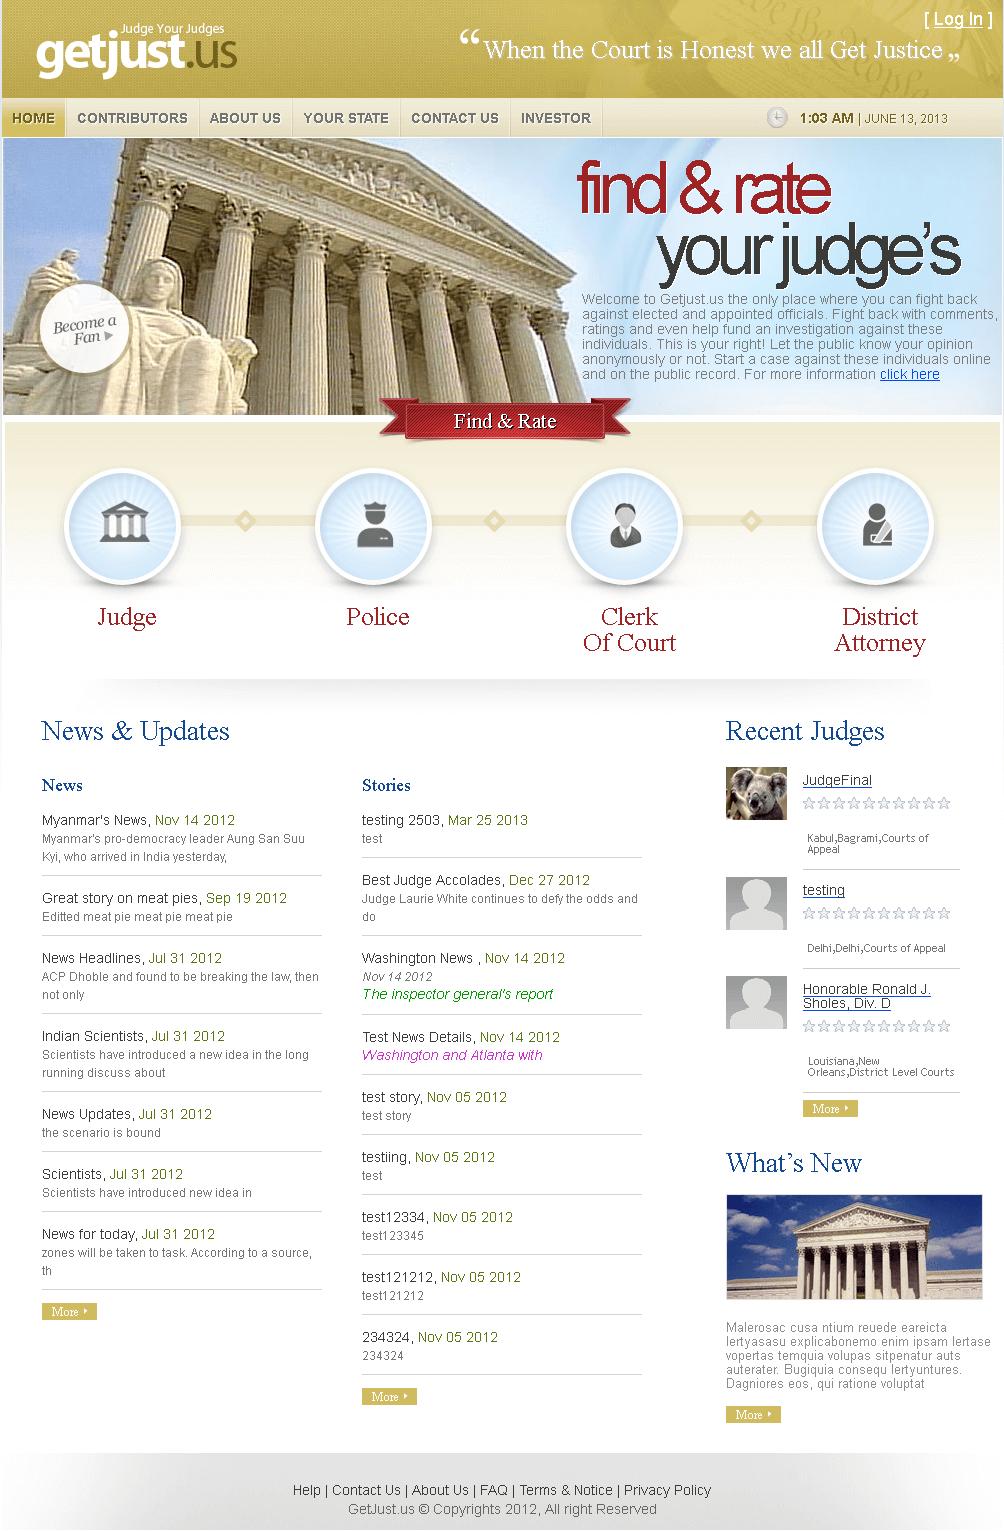 Dot Net Website to Find & Rate Your Judge's Online 'getjust'